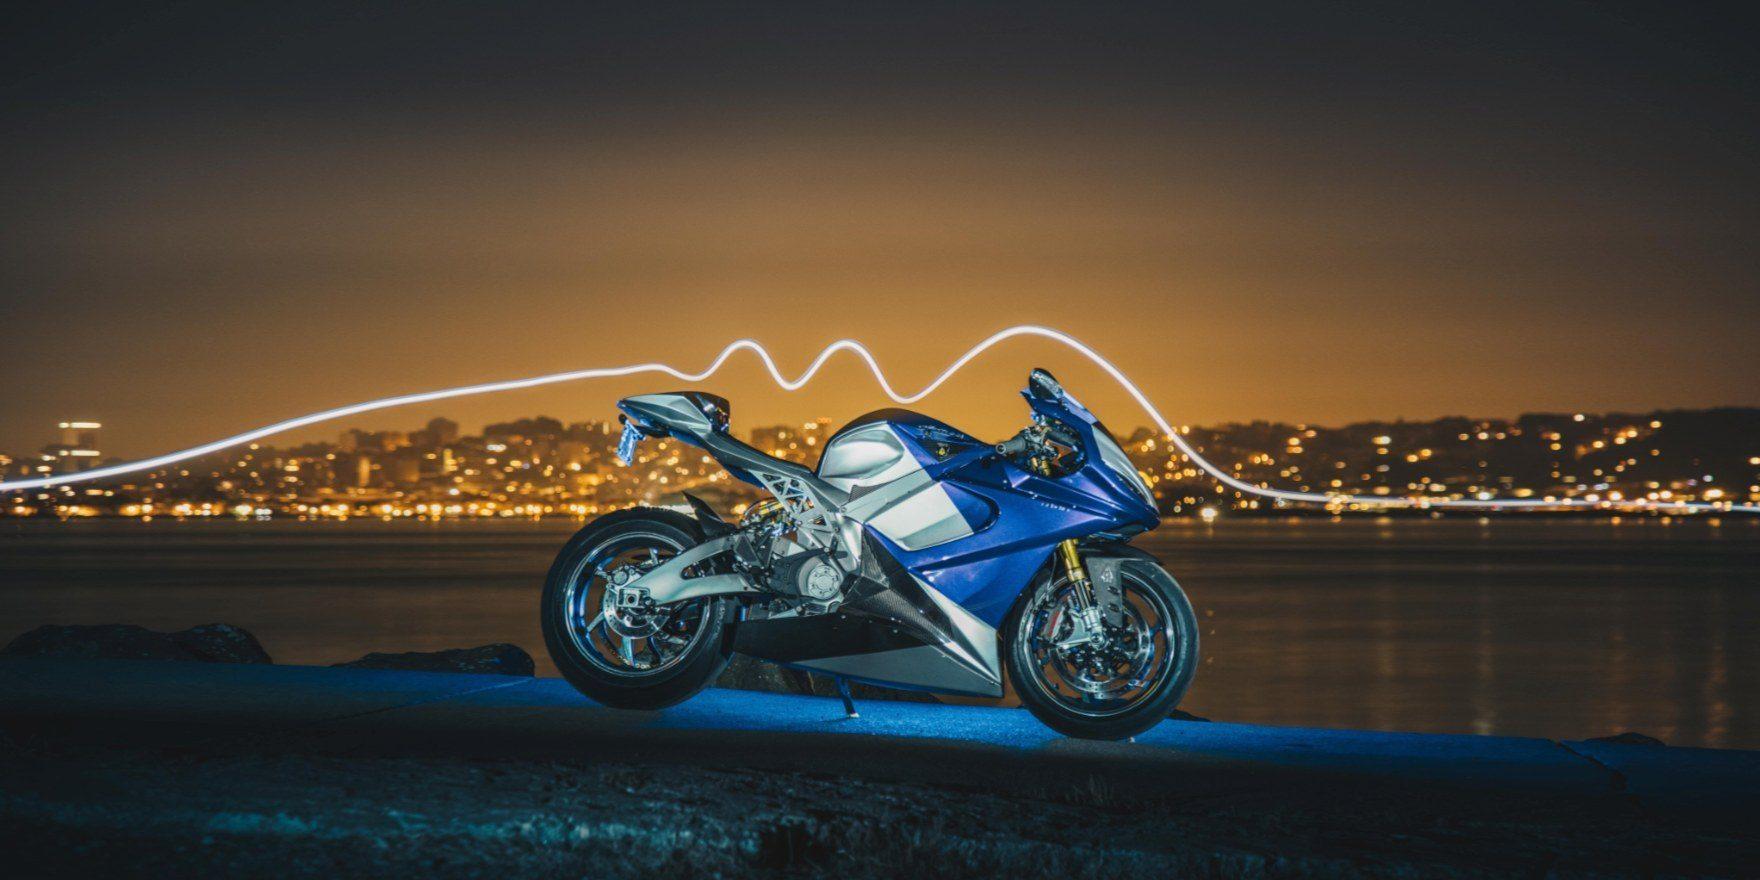 Süper Hızlı Elektrikli Motosiklet Lightning LS-218 Superbike